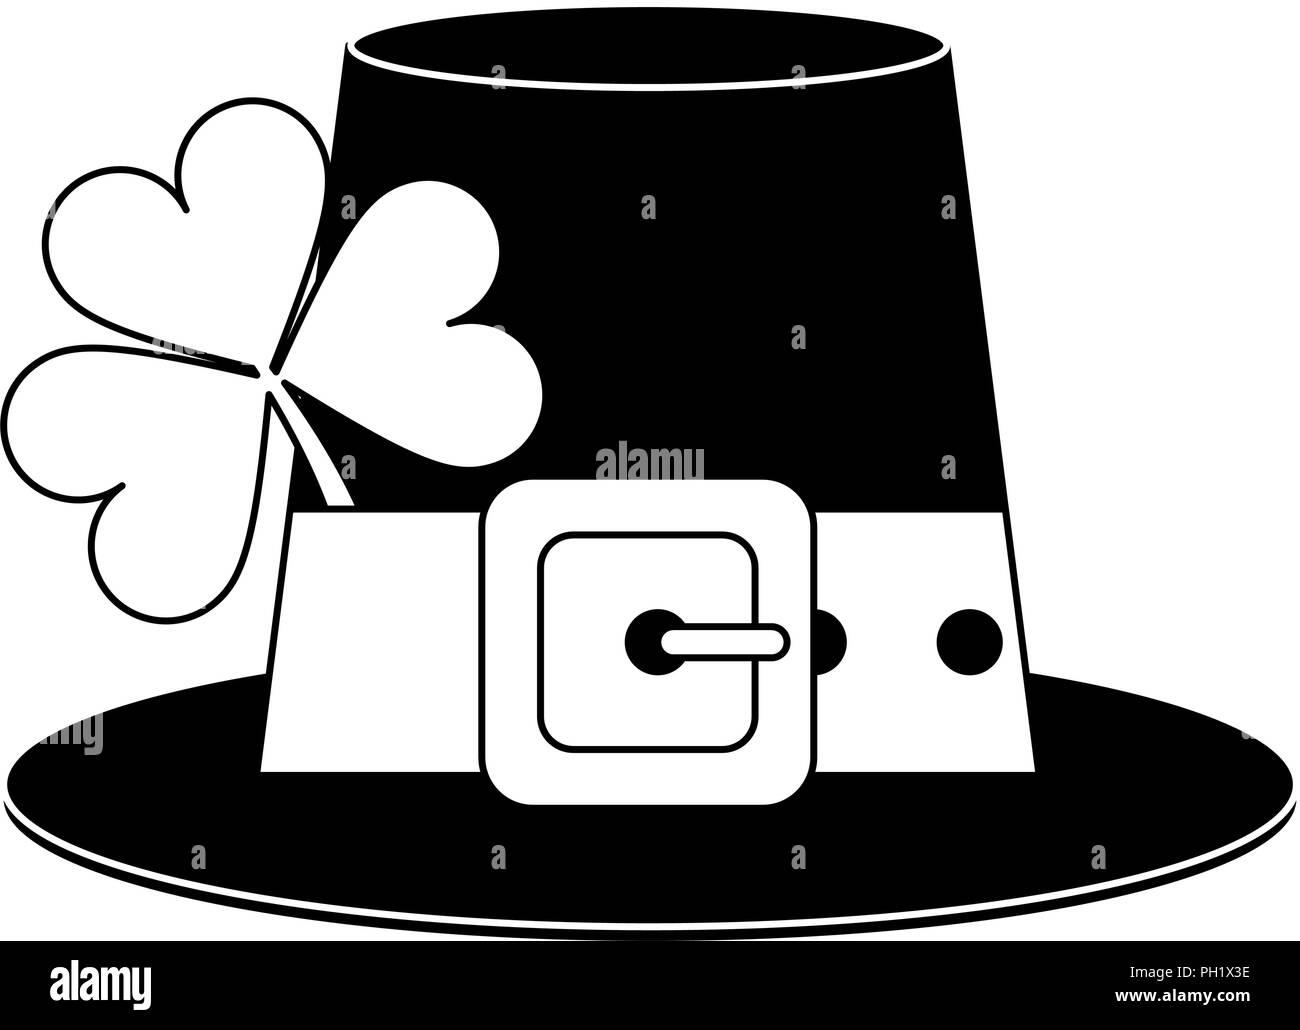 445f6871f3f Irish elf hat element in black and white - Stock Image